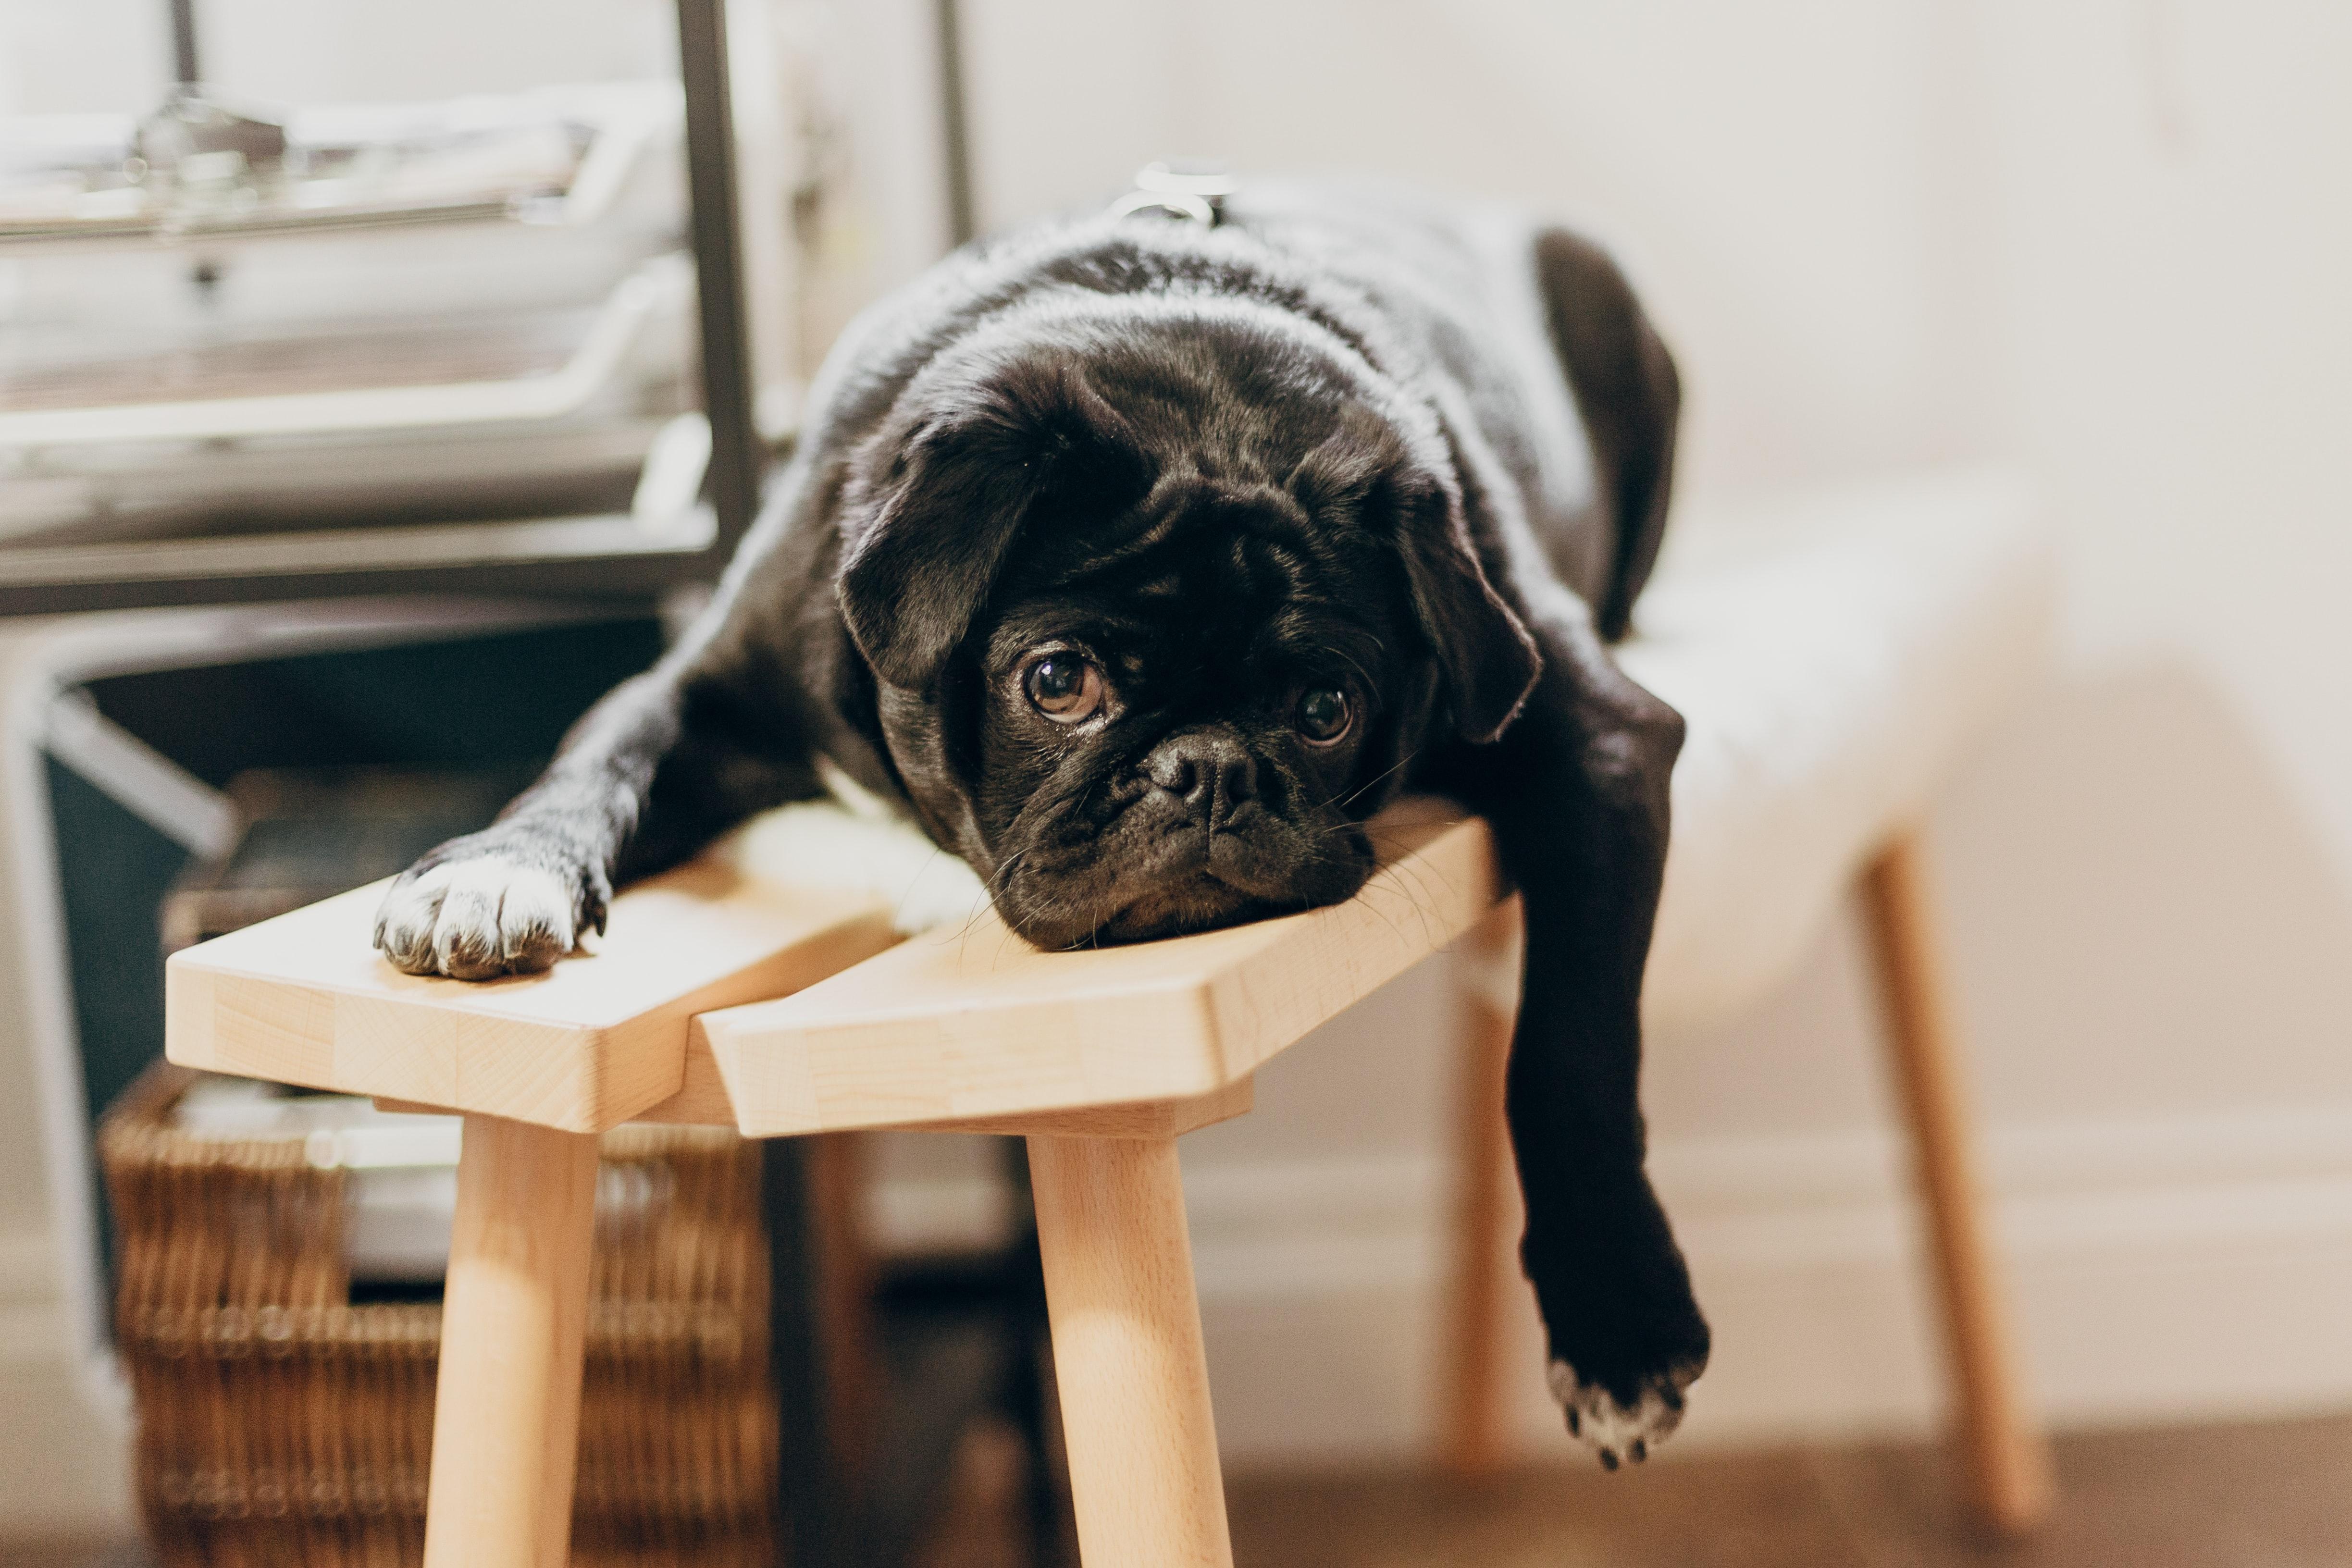 Photo of a black pug sitting on a stool. Image courtesy of Priscilla Du Preez via Unsplash.